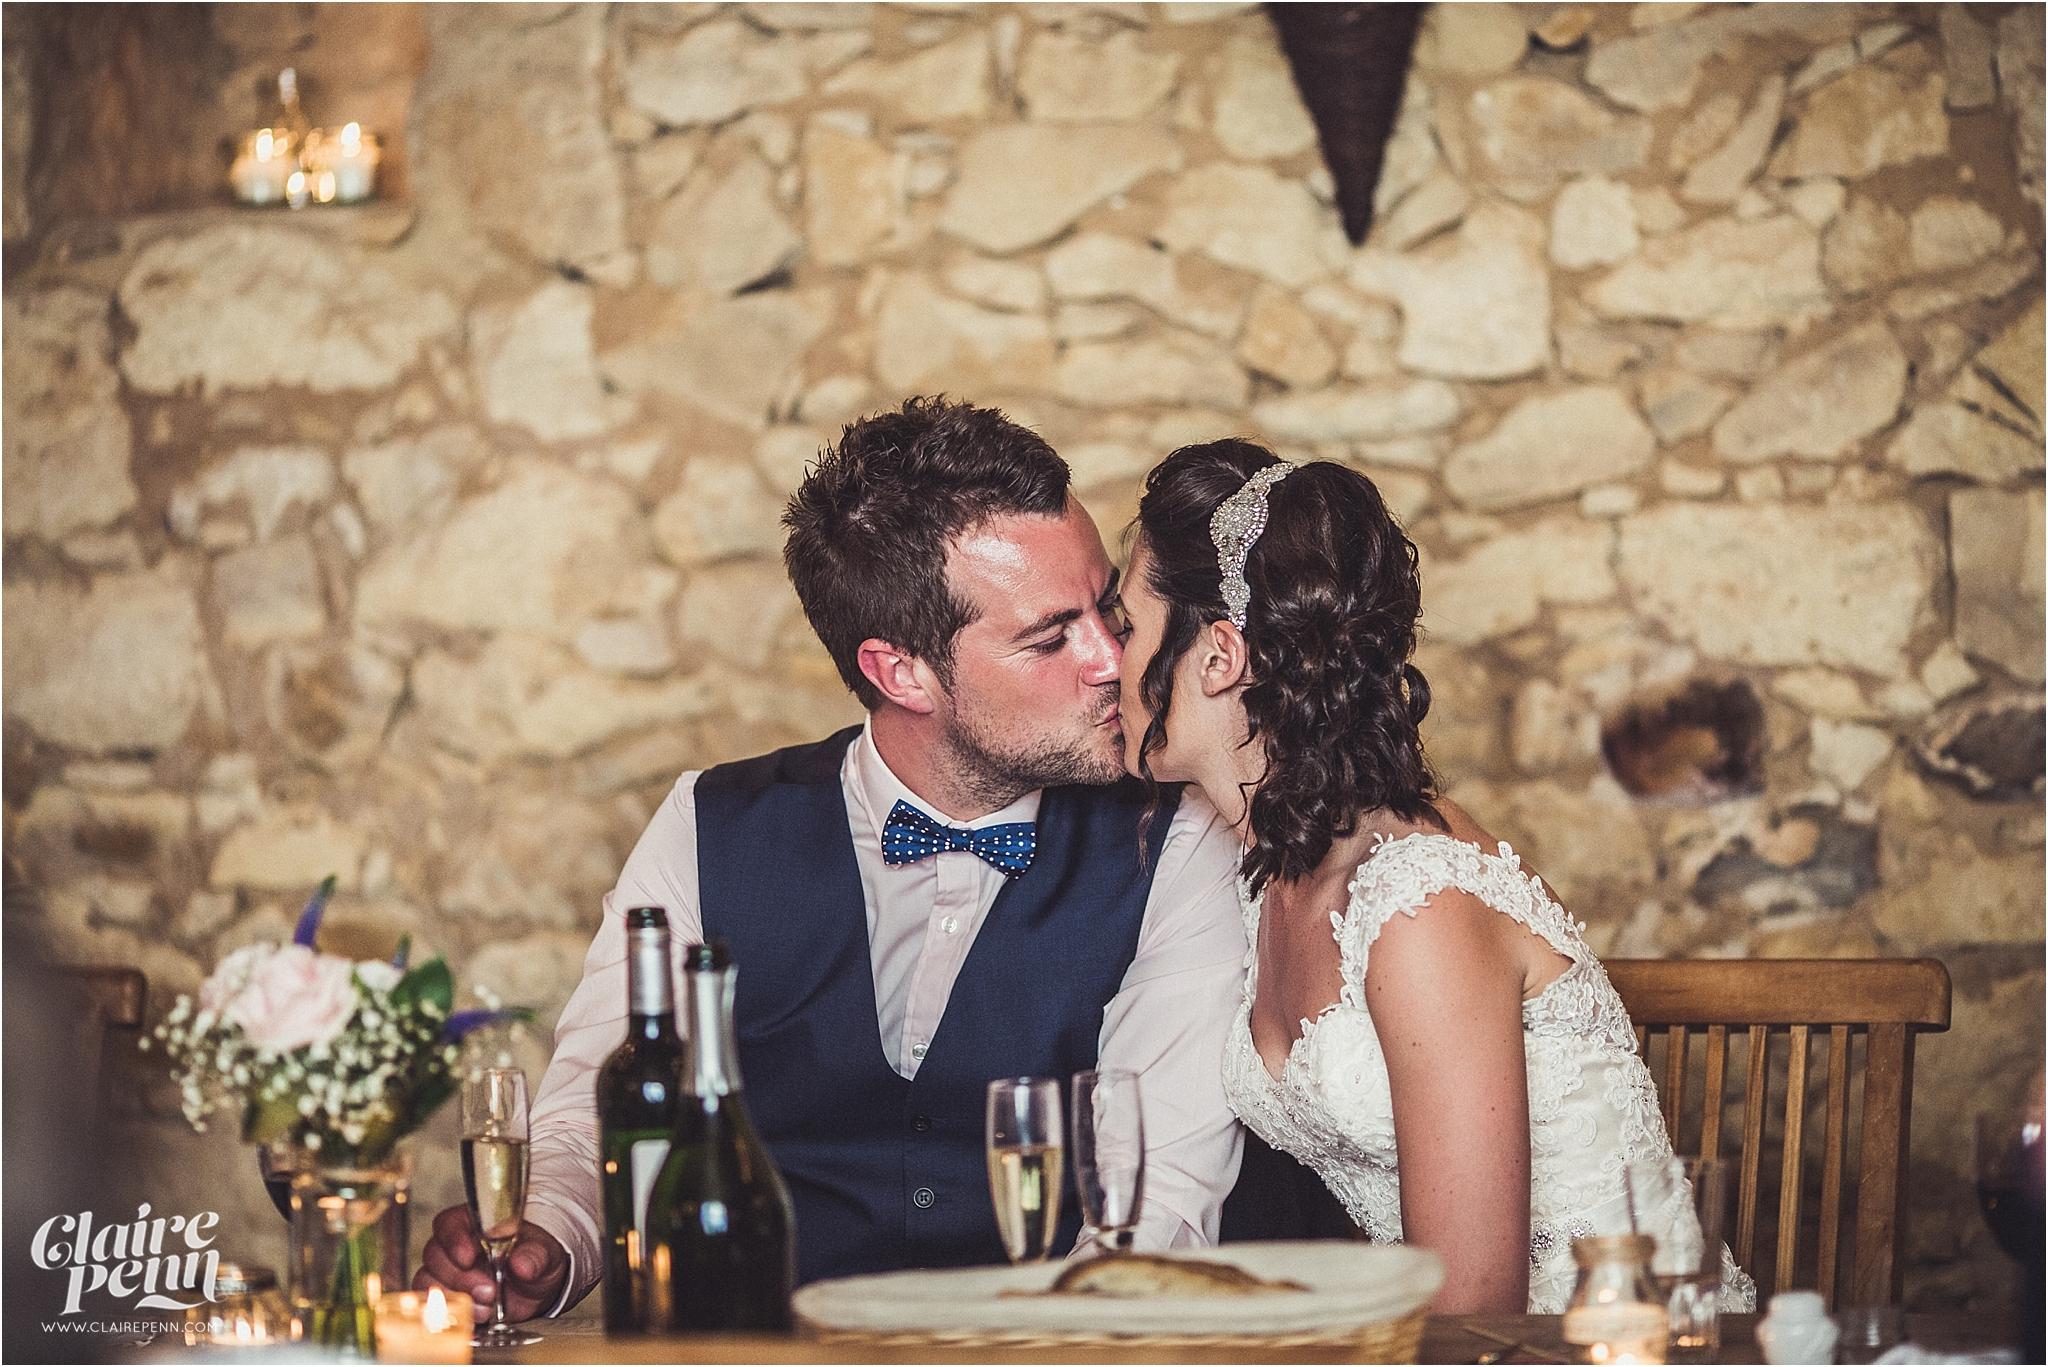 La Leotardie wedding Dordogne France_0078.jpg